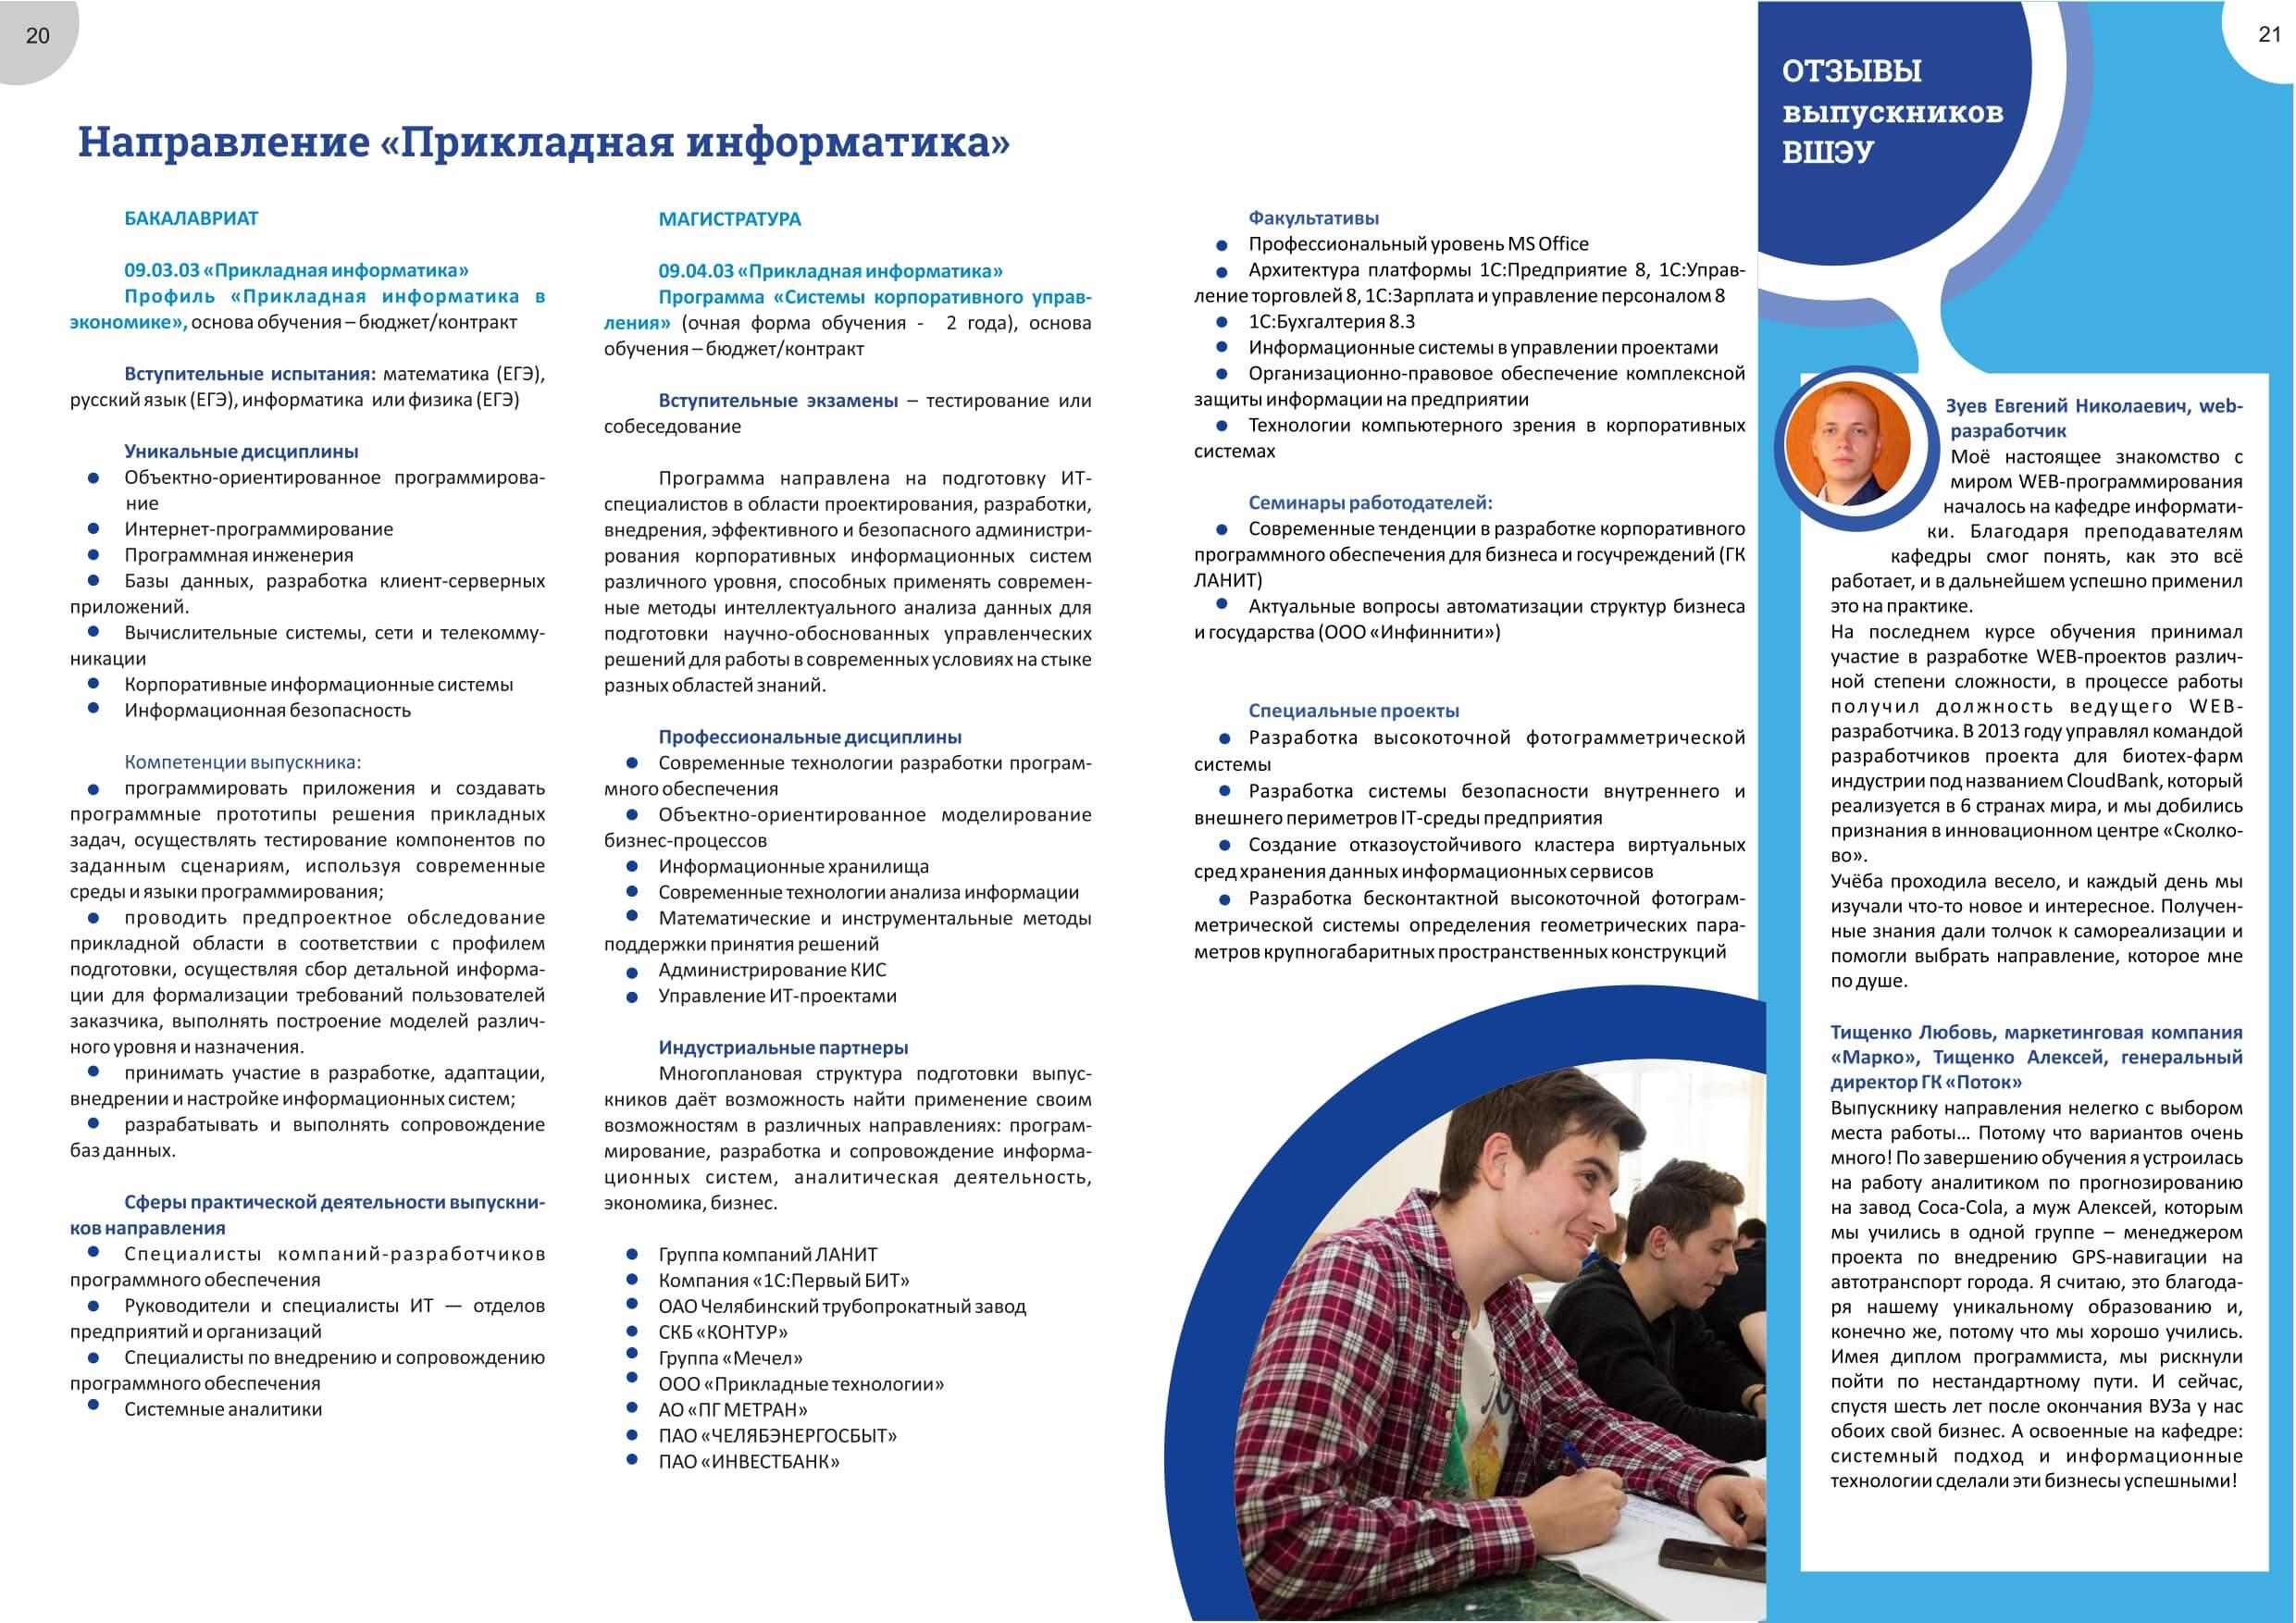 ВШЭУ Прием абитуриентов 2021_pages-to-jpg-0011